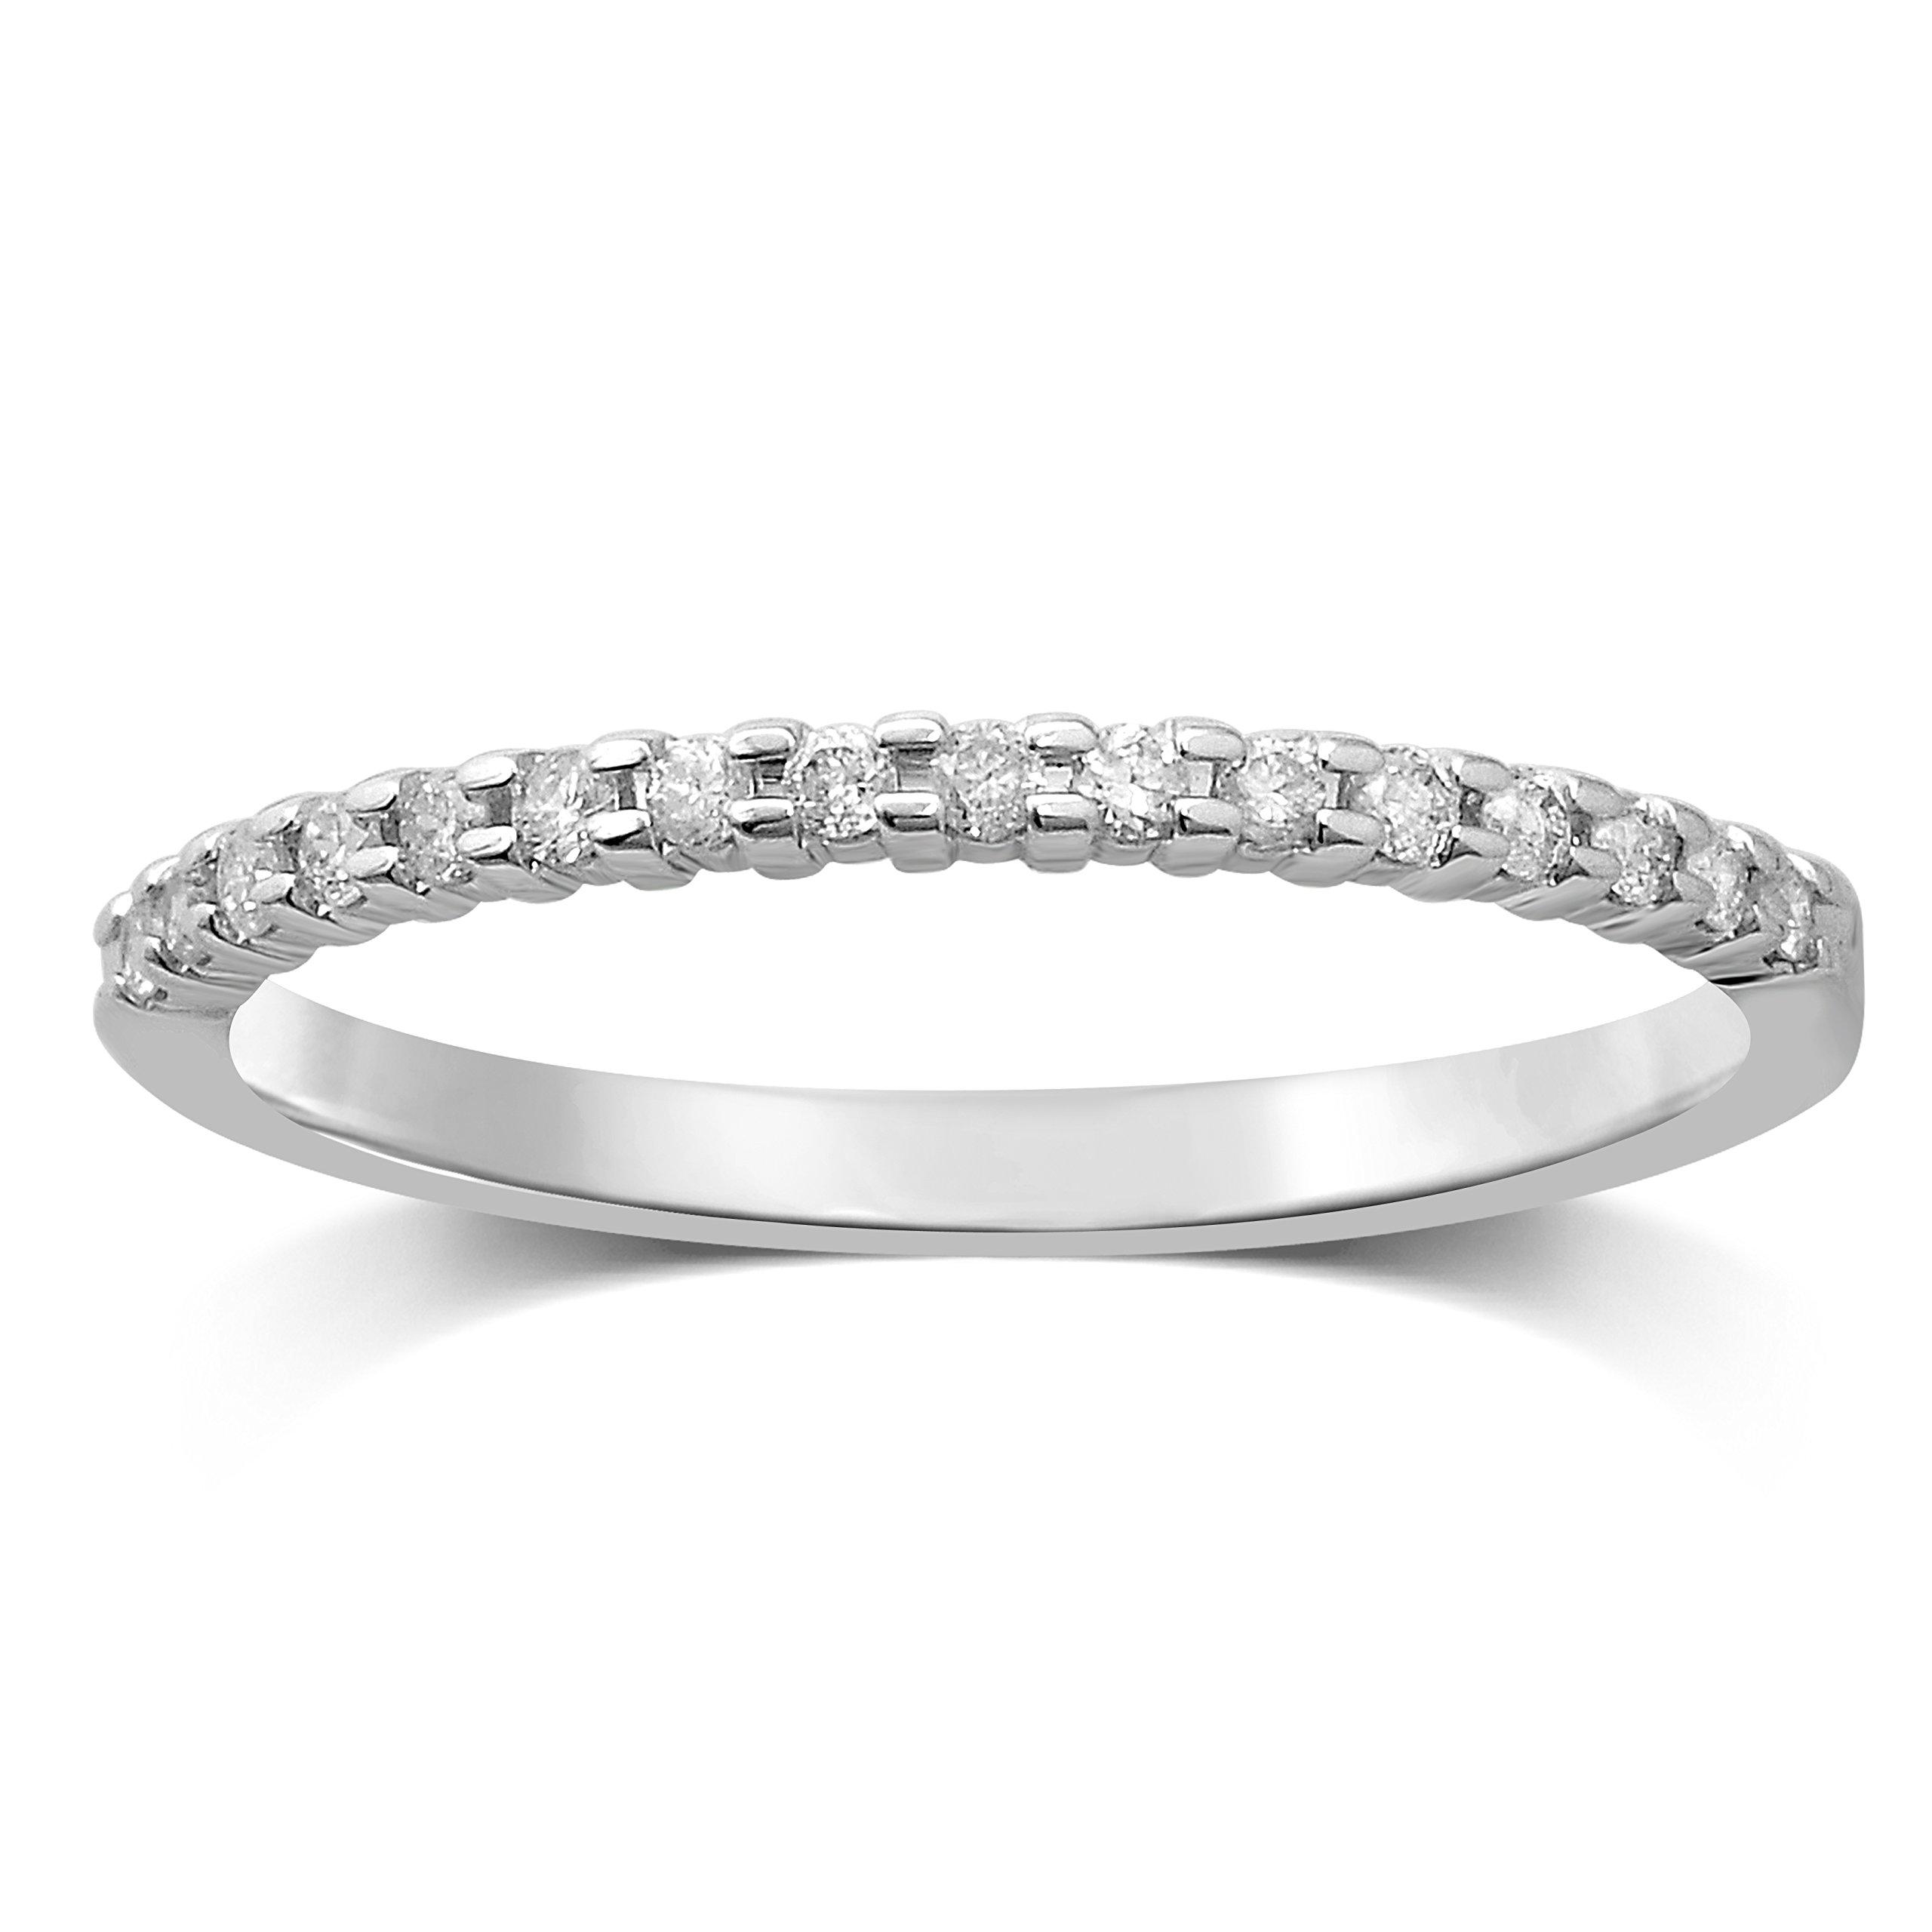 Diamond Jewel 10k White Gold 1/7 cttw Diamond Stackable Ring